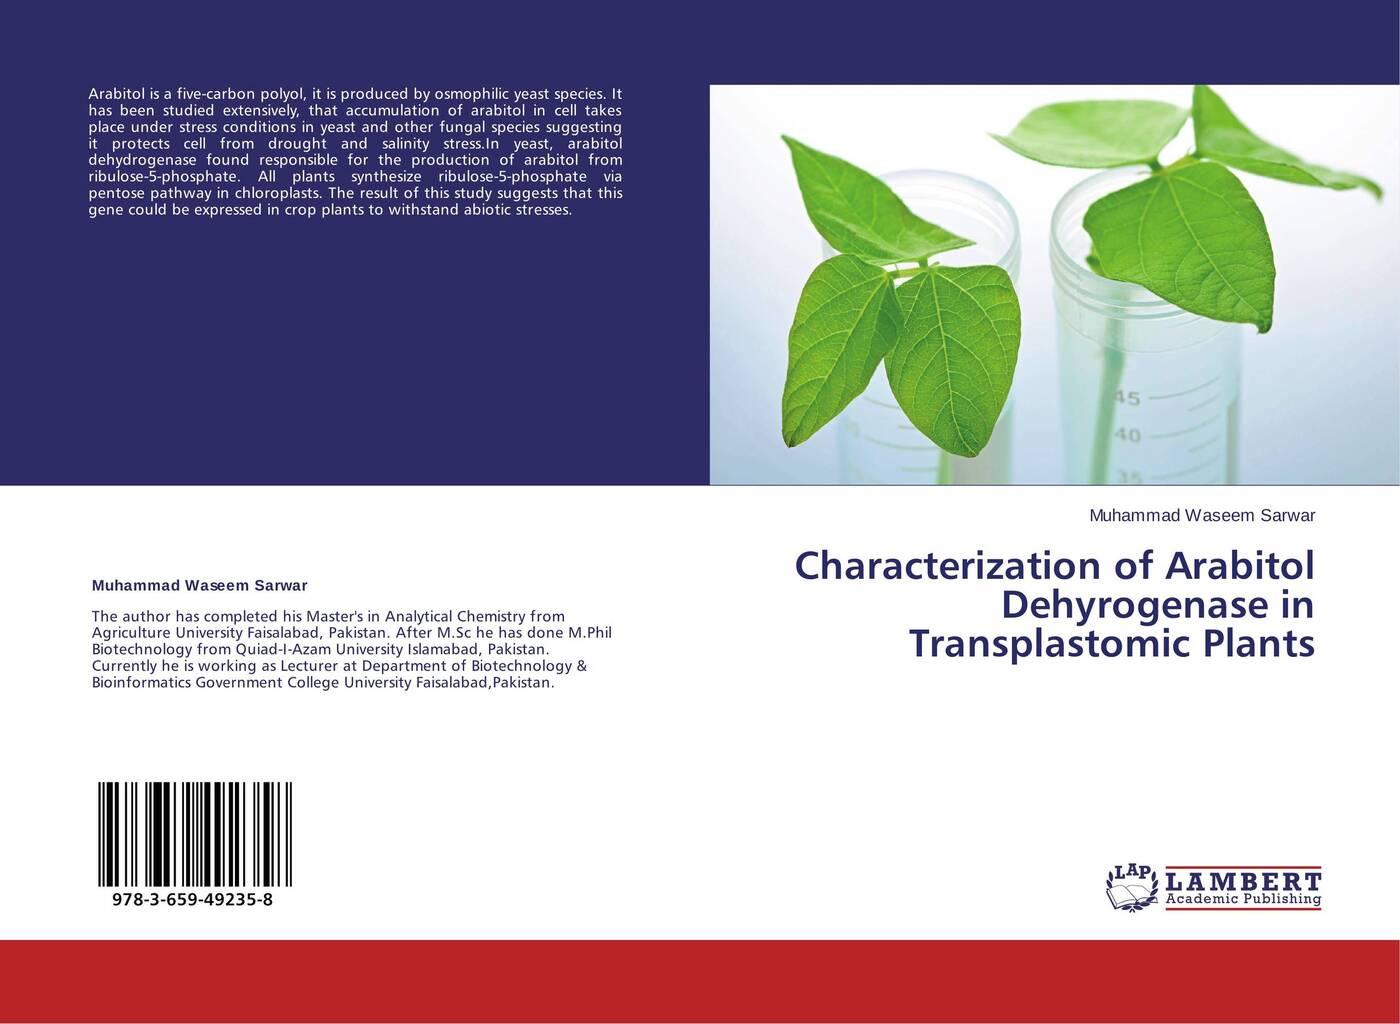 Muhammad Waseem Sarwar Characterization of Arabitol Dehyrogenase in Transplastomic Plants stephen checkley engineering tuneable gene circuits in yeast